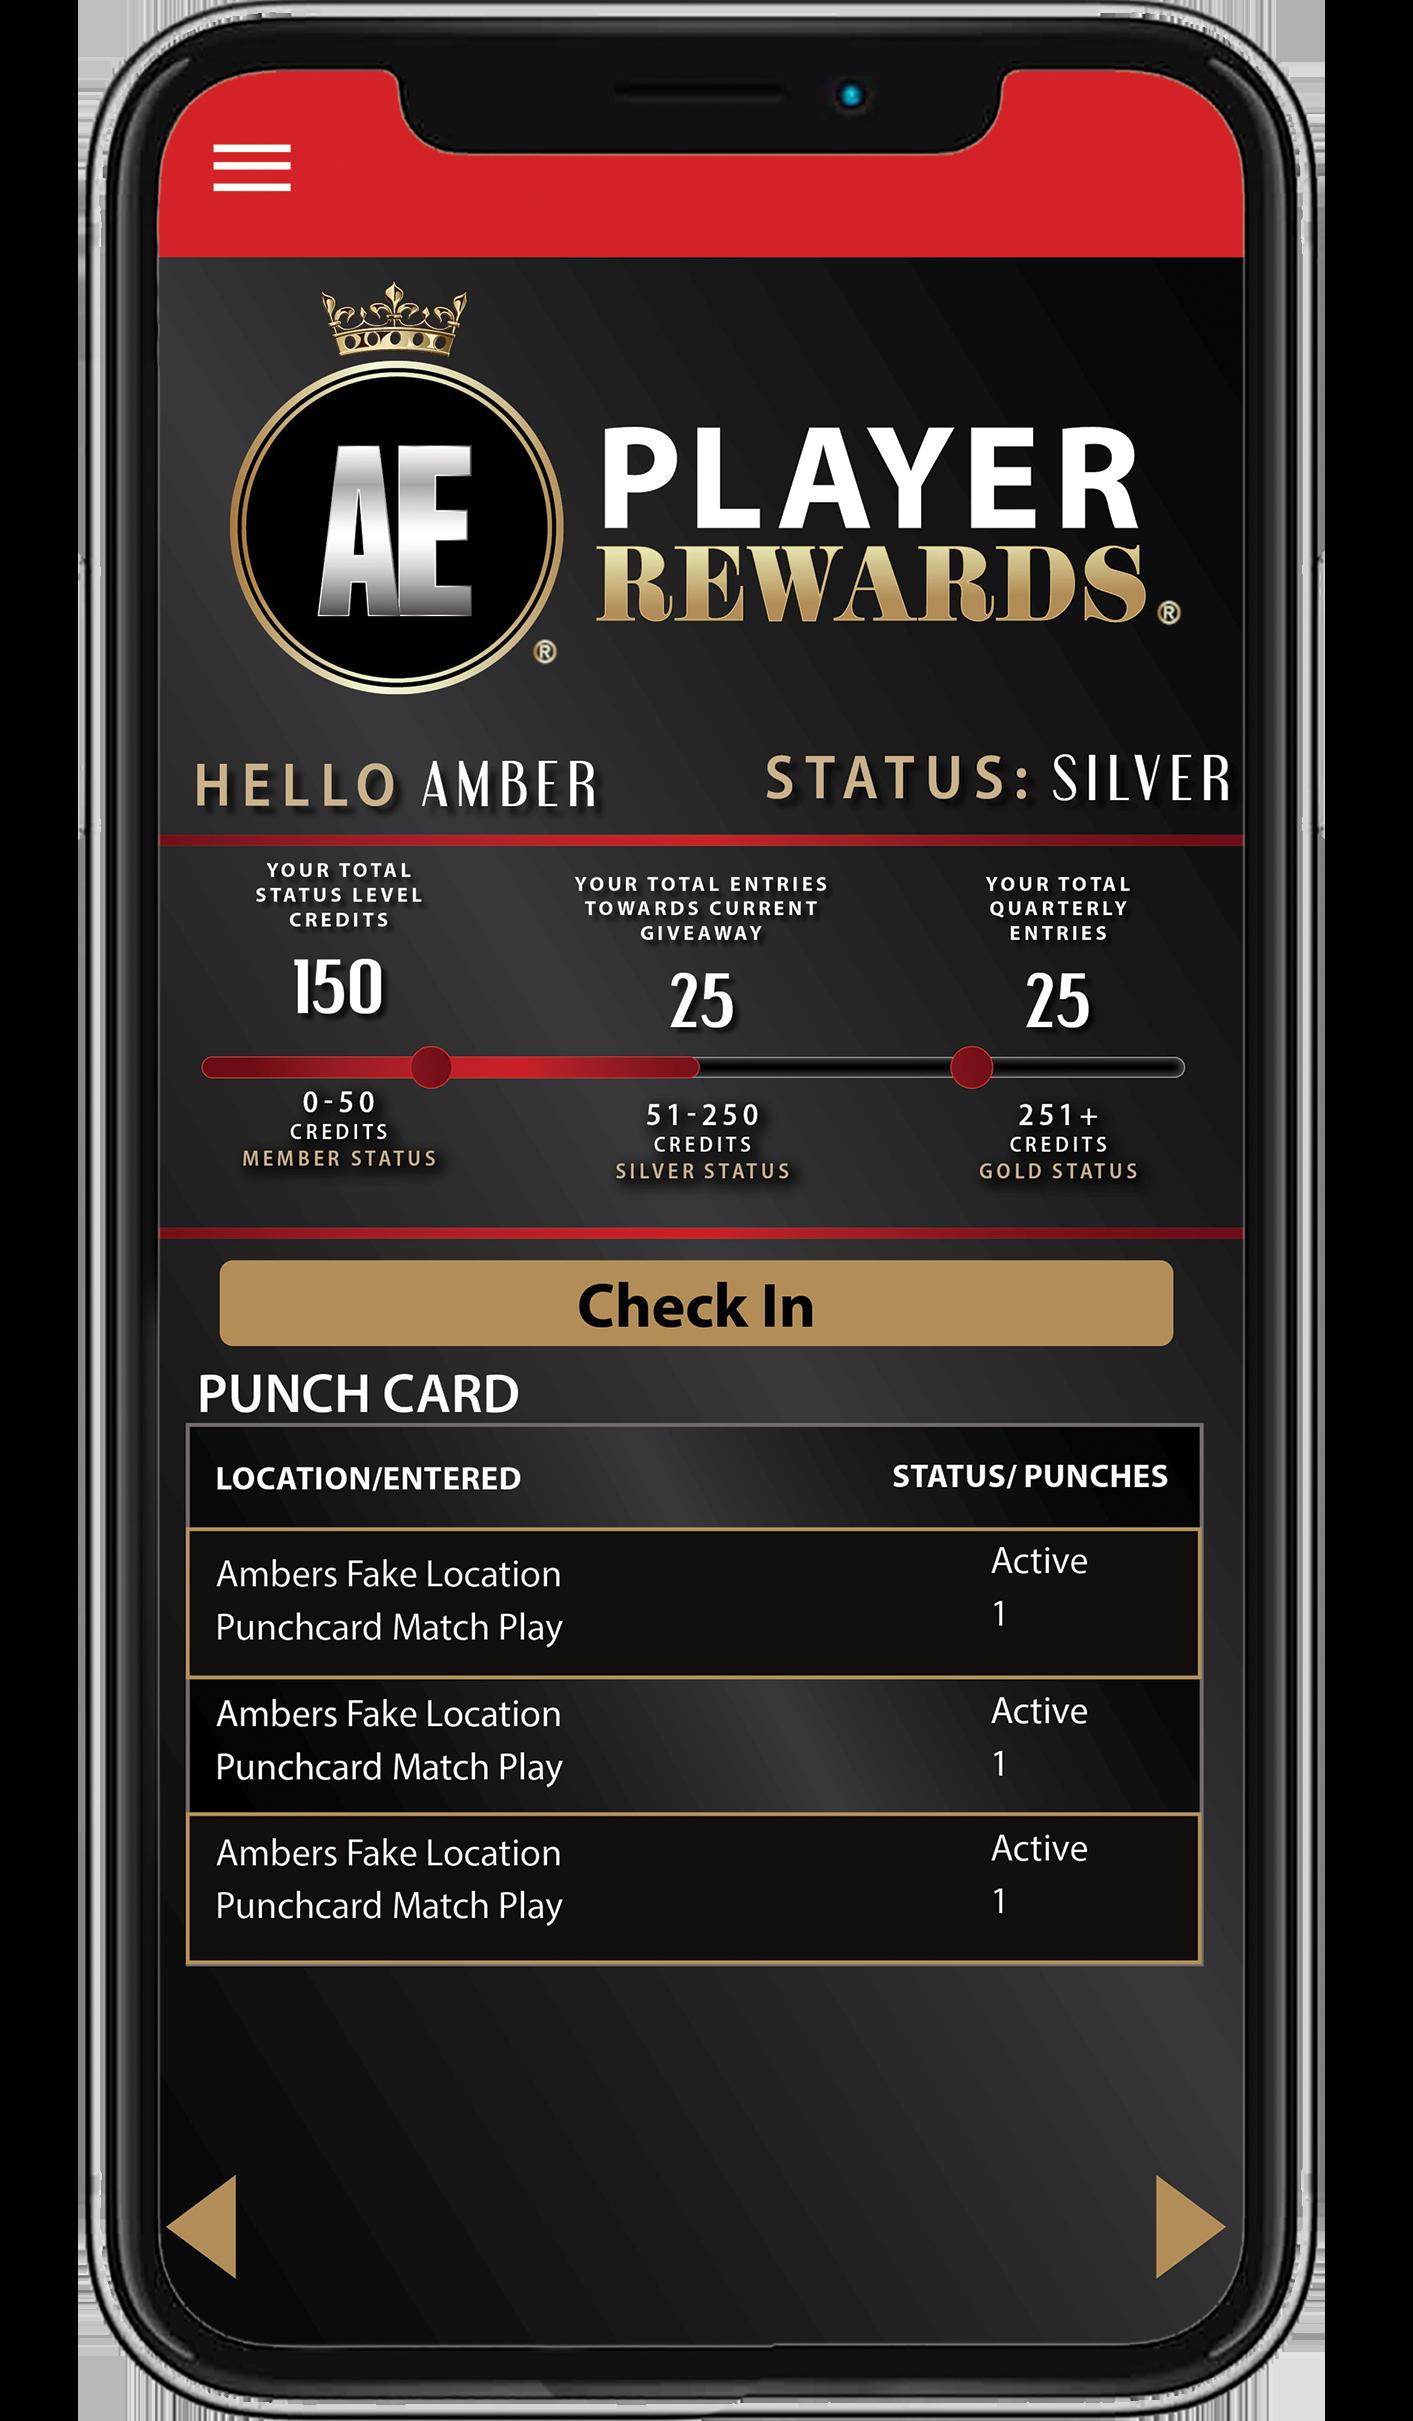 AEPlayer App_Home Screen08